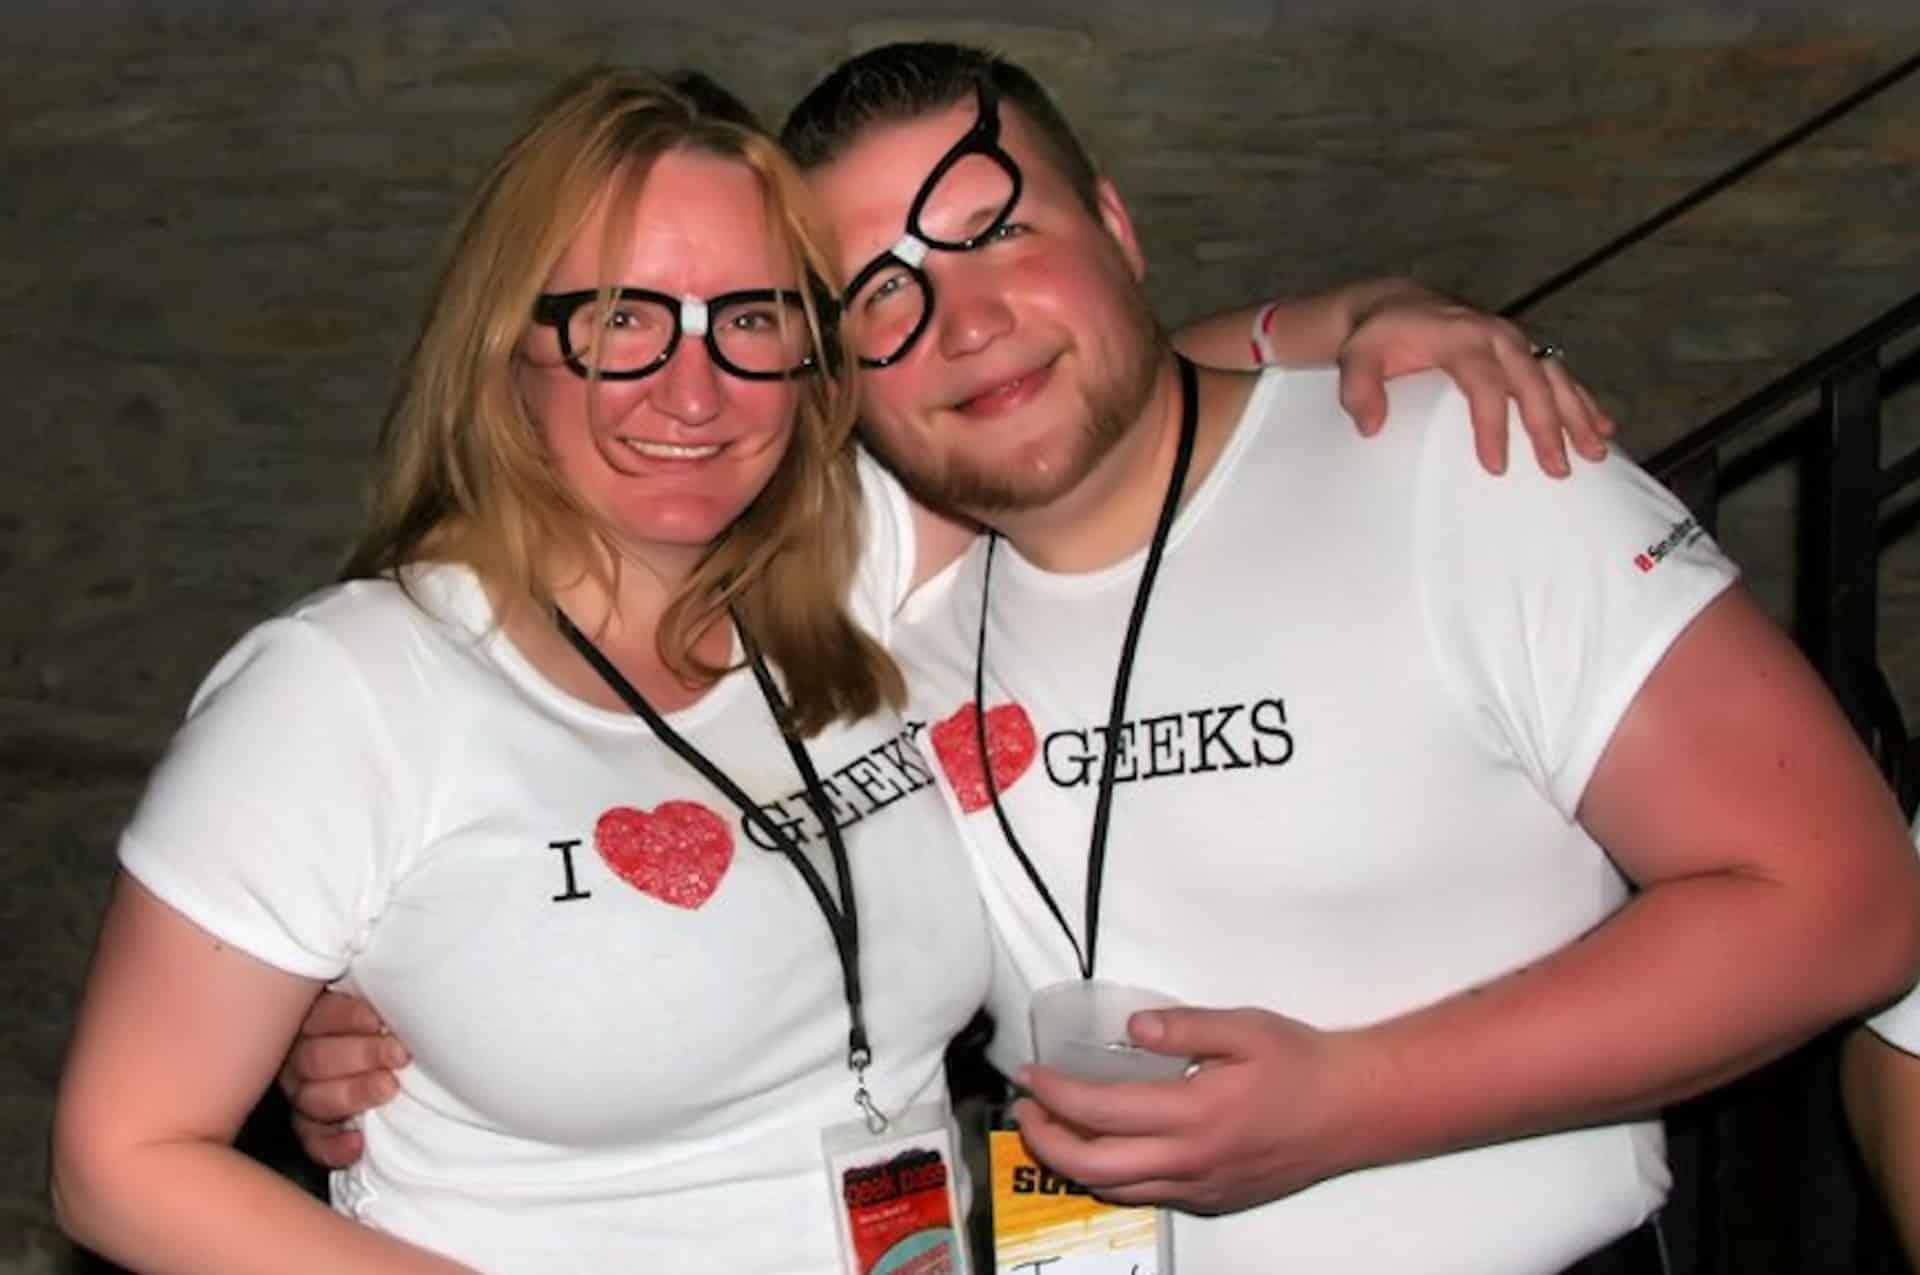 SXSW 2010 - I Heart Geeks